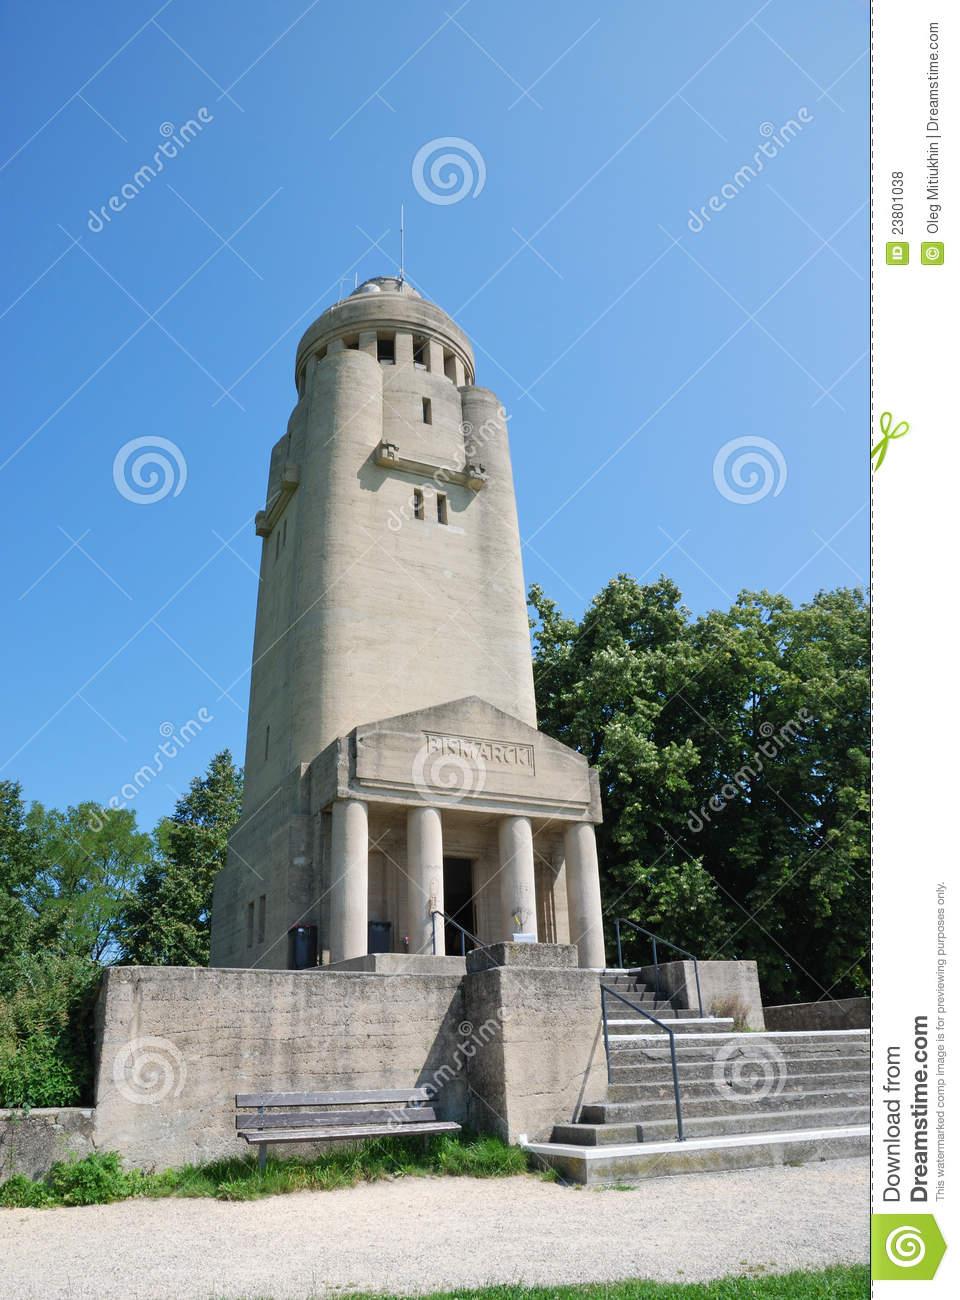 Bismarck Tower In Konstanz. Royalty Free Stock Photos.